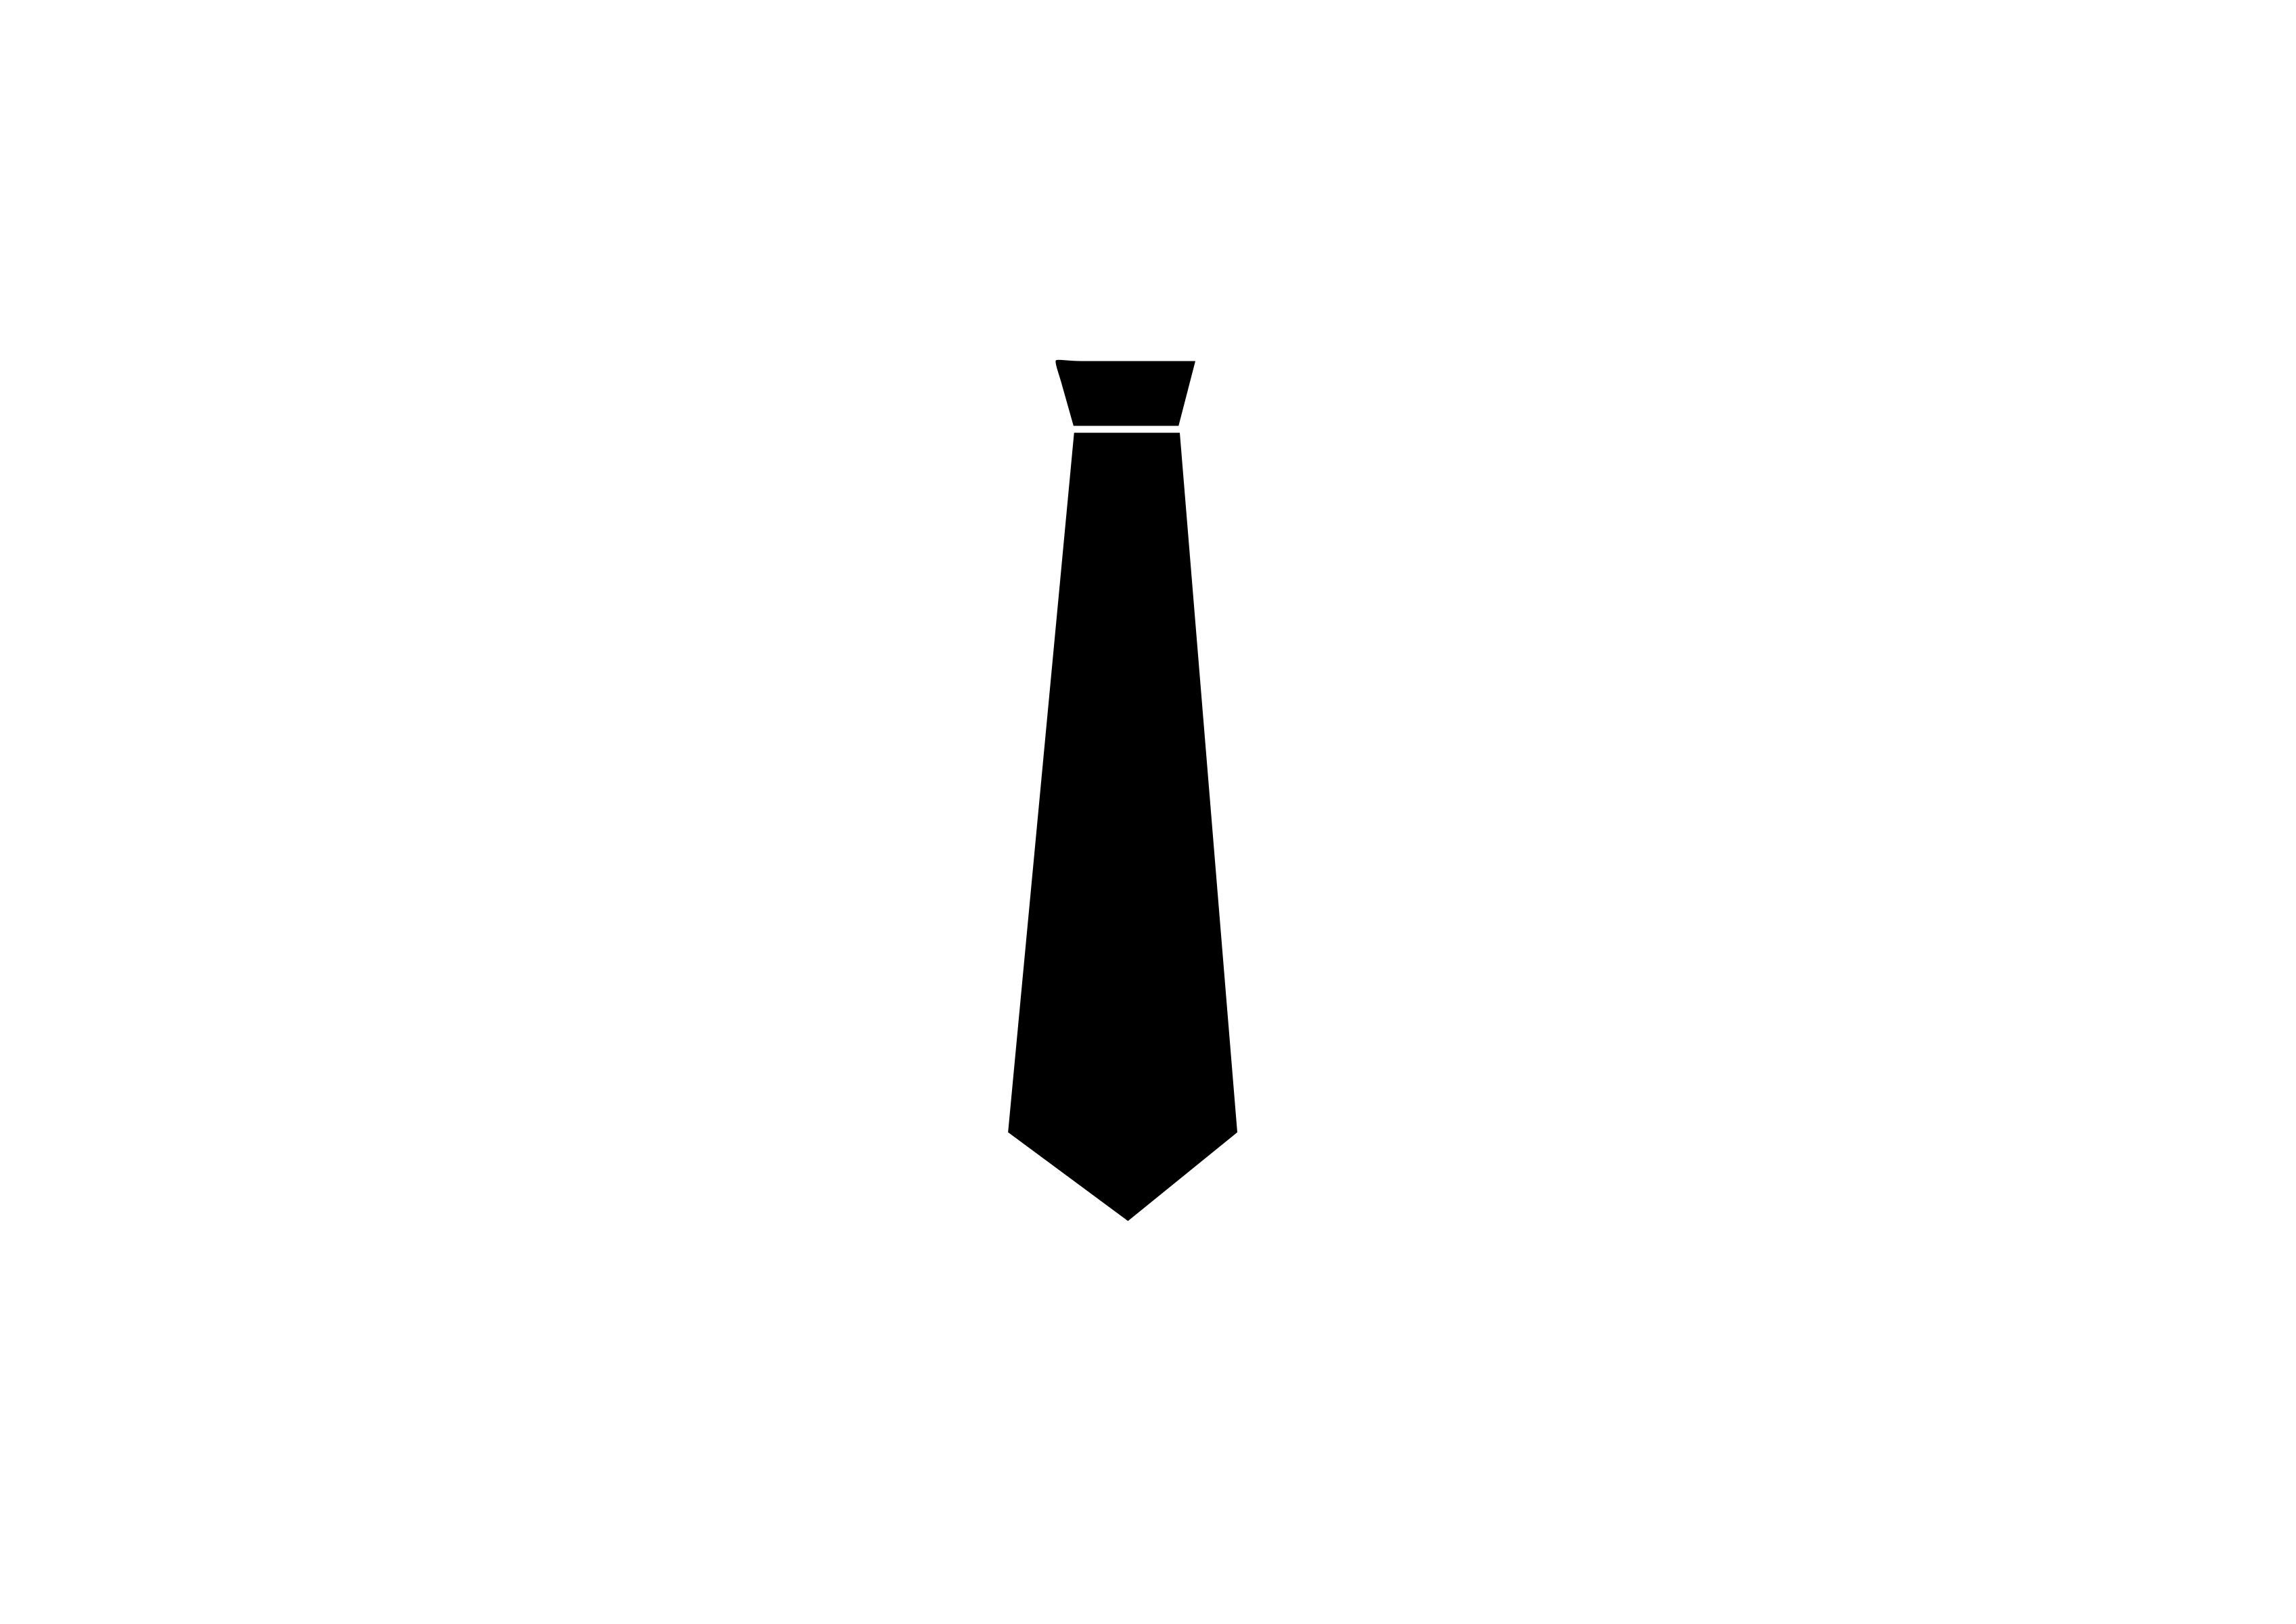 Clipart - Tie